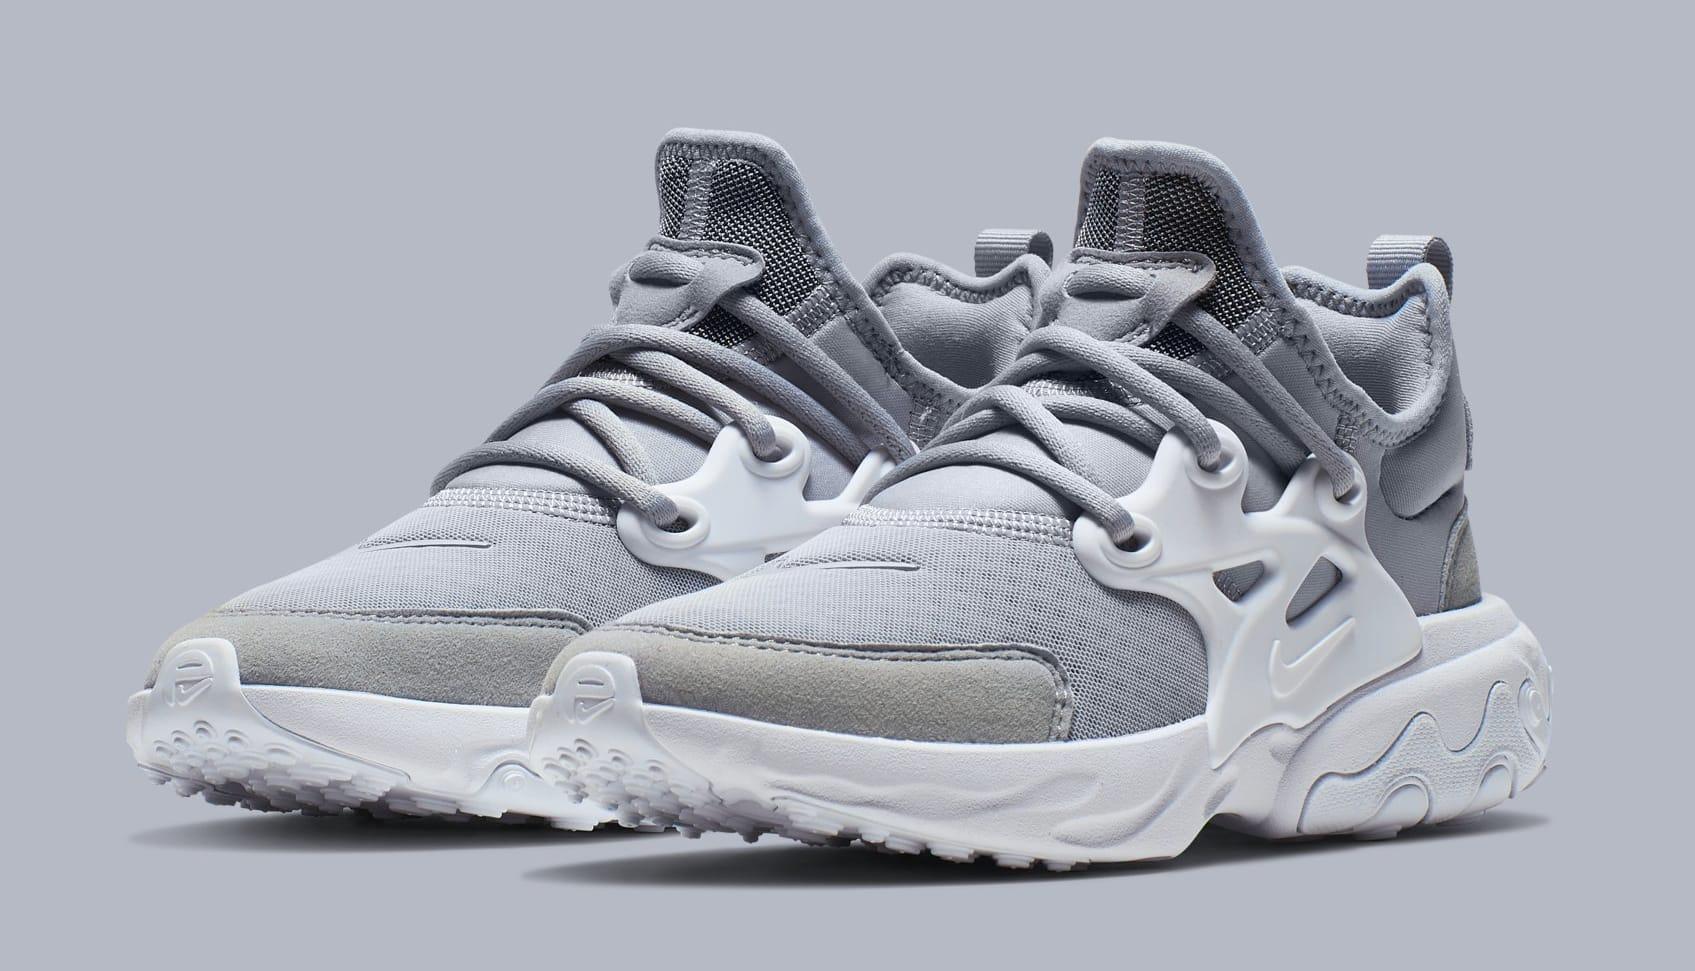 Nike Presto React BQ4002-002 (Pair)